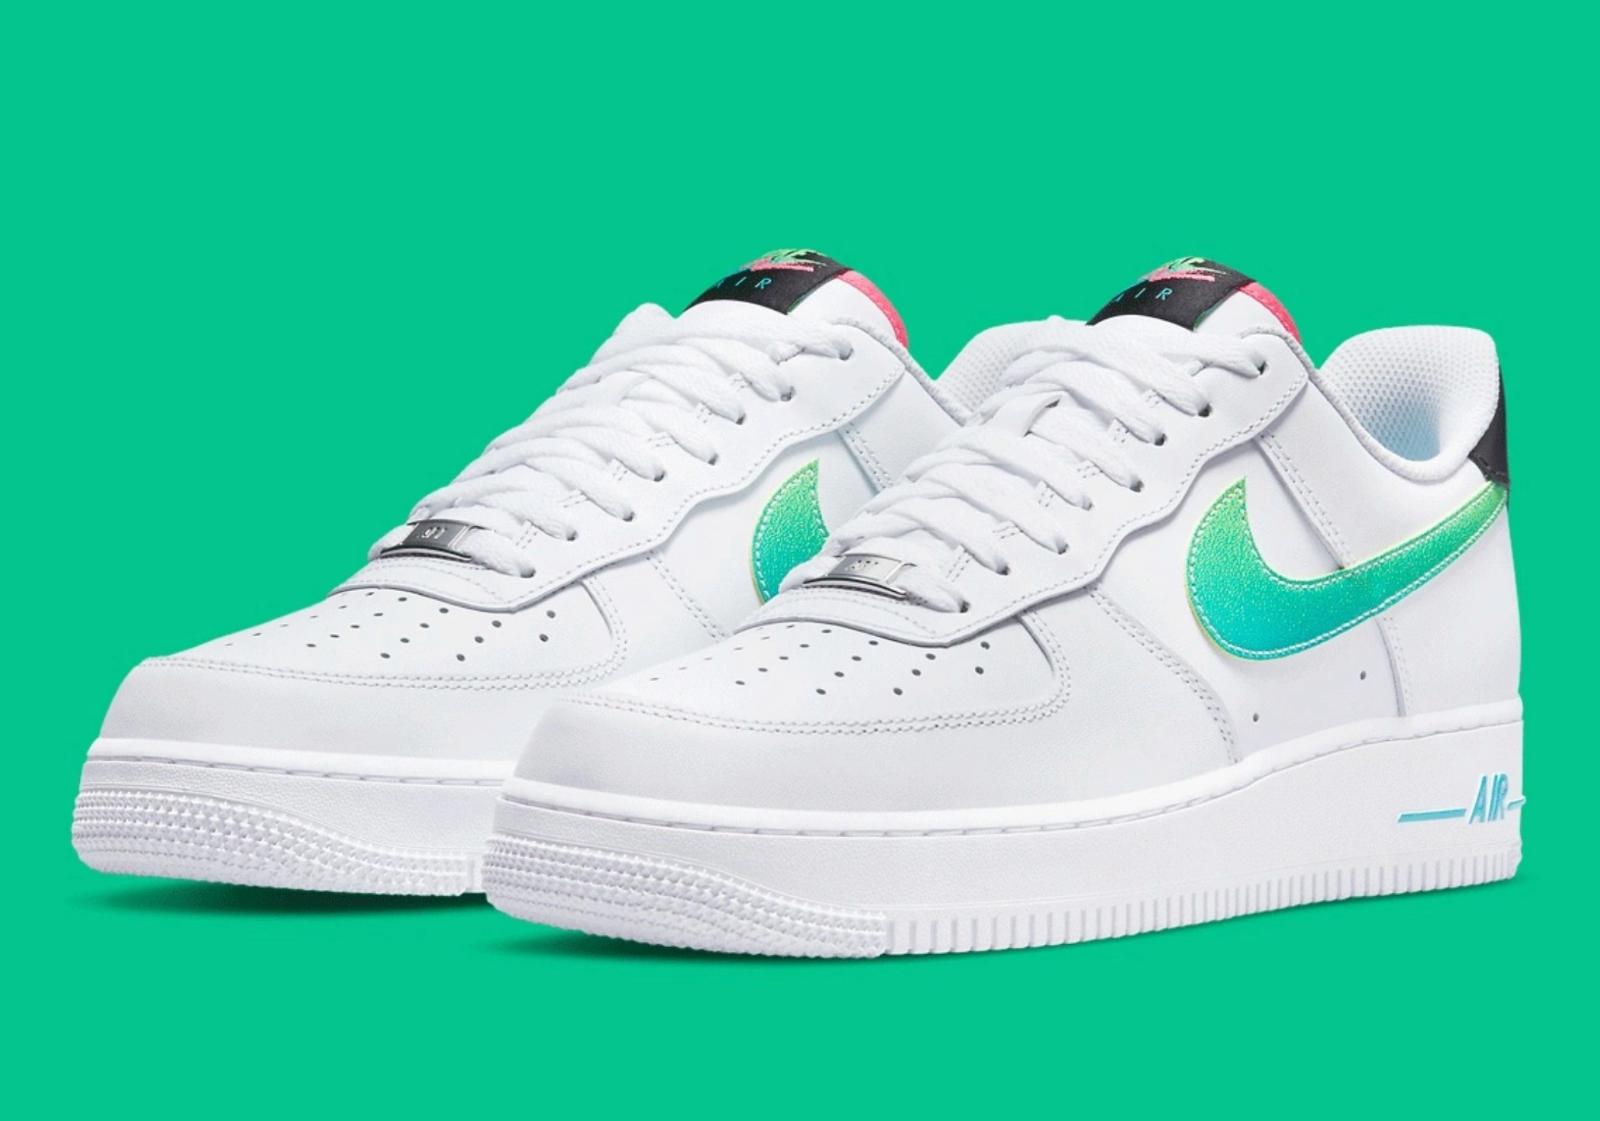 Nike Air Force 1 '07 LV8 Shoes White Green Strike Aquamarine DJ5148-100 Men's